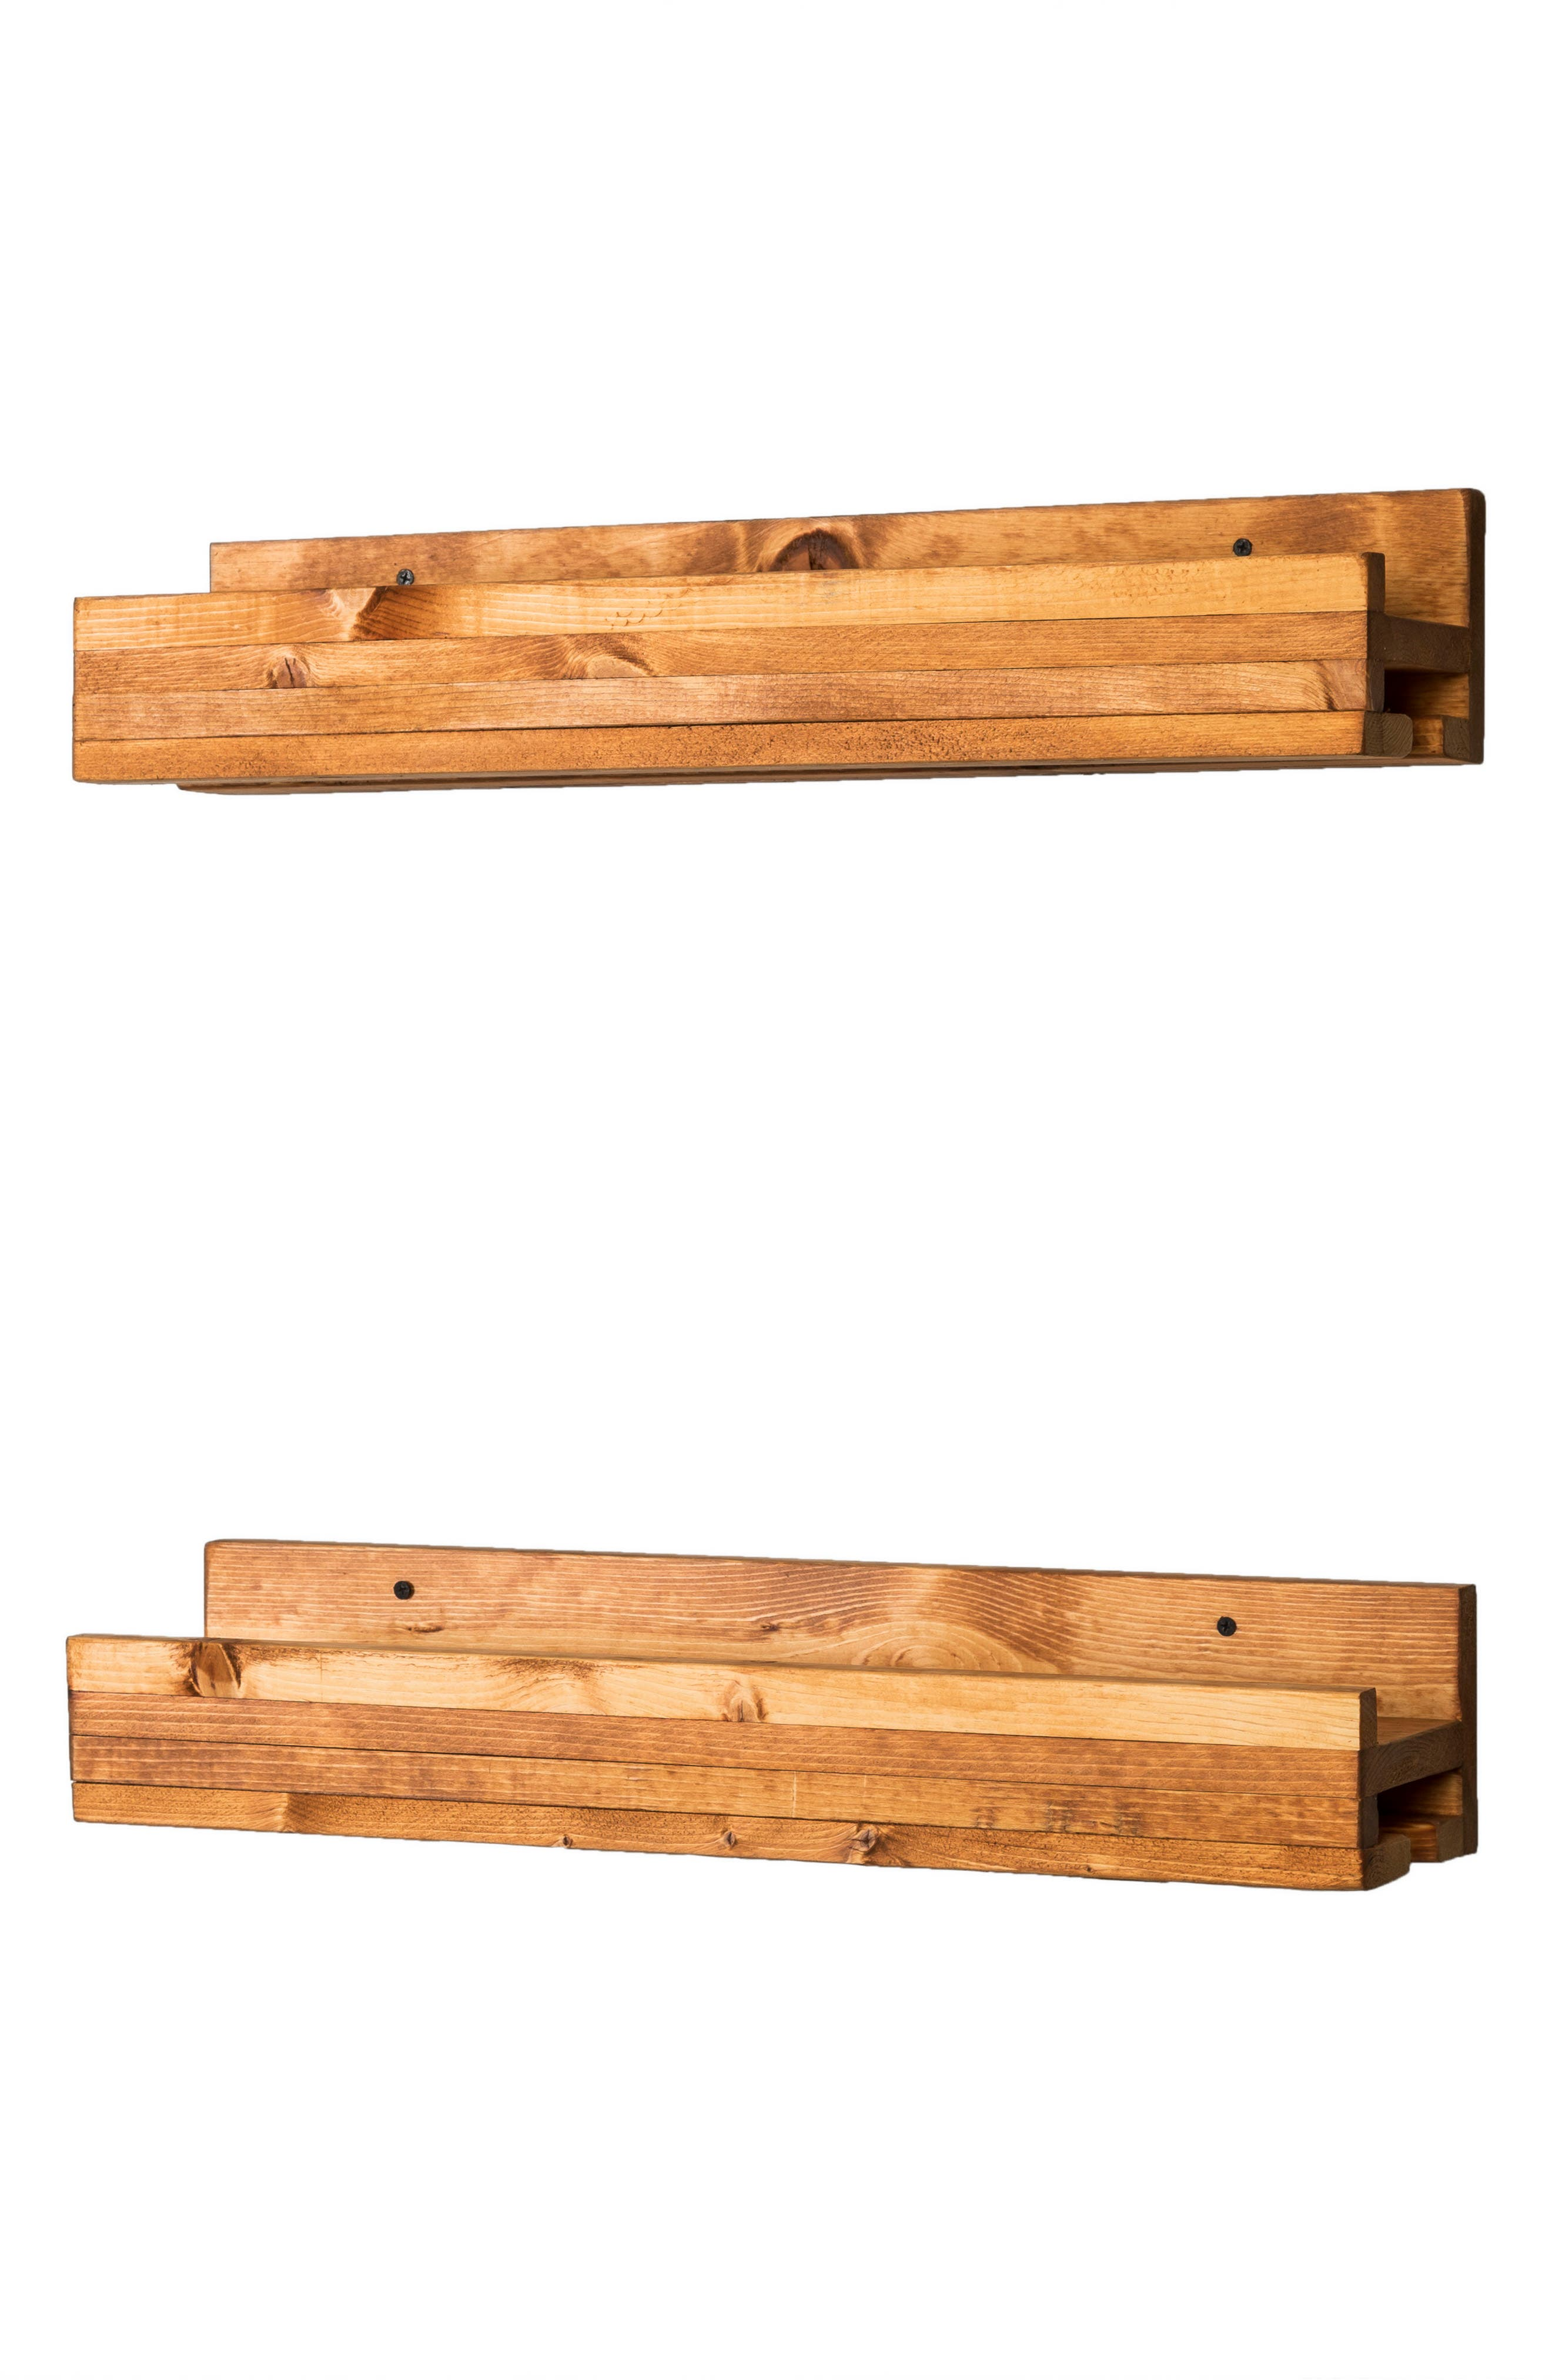 Alternate Image 3  - (del)Hutson Designs Set of 2 Pine Wood Wine Racks